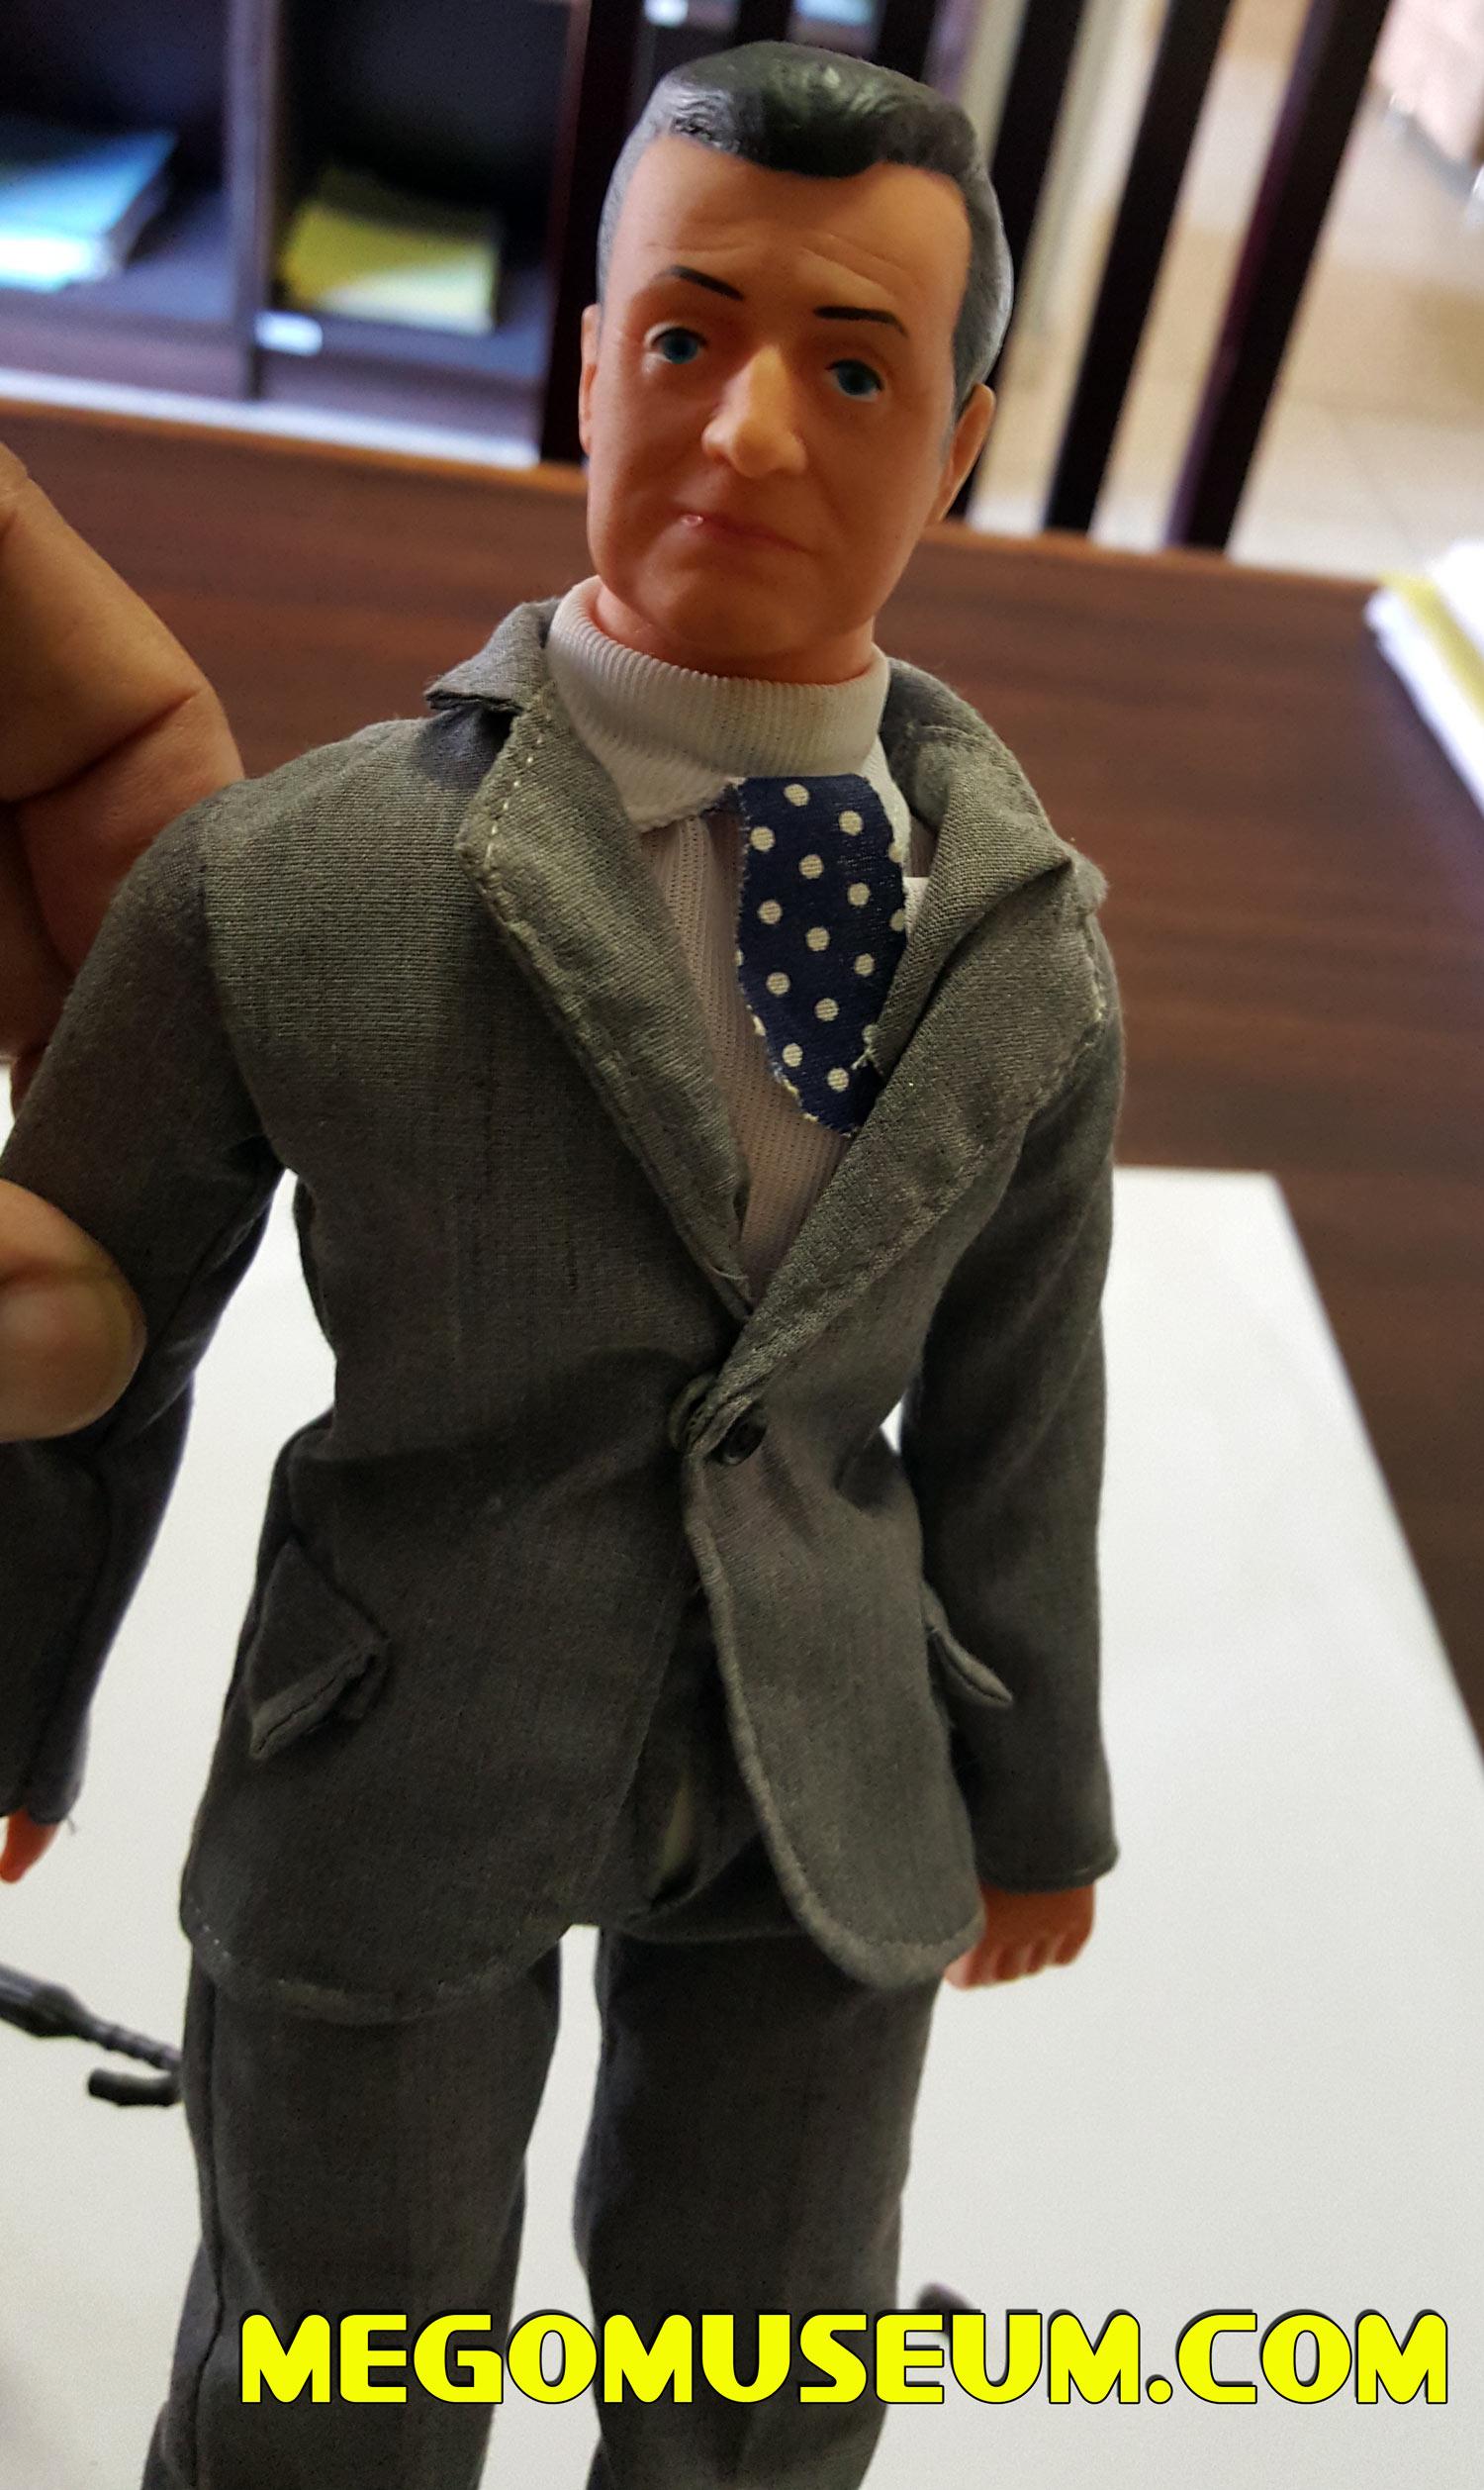 MegoMuseum New Avengers John Steed Action Figure Discovery